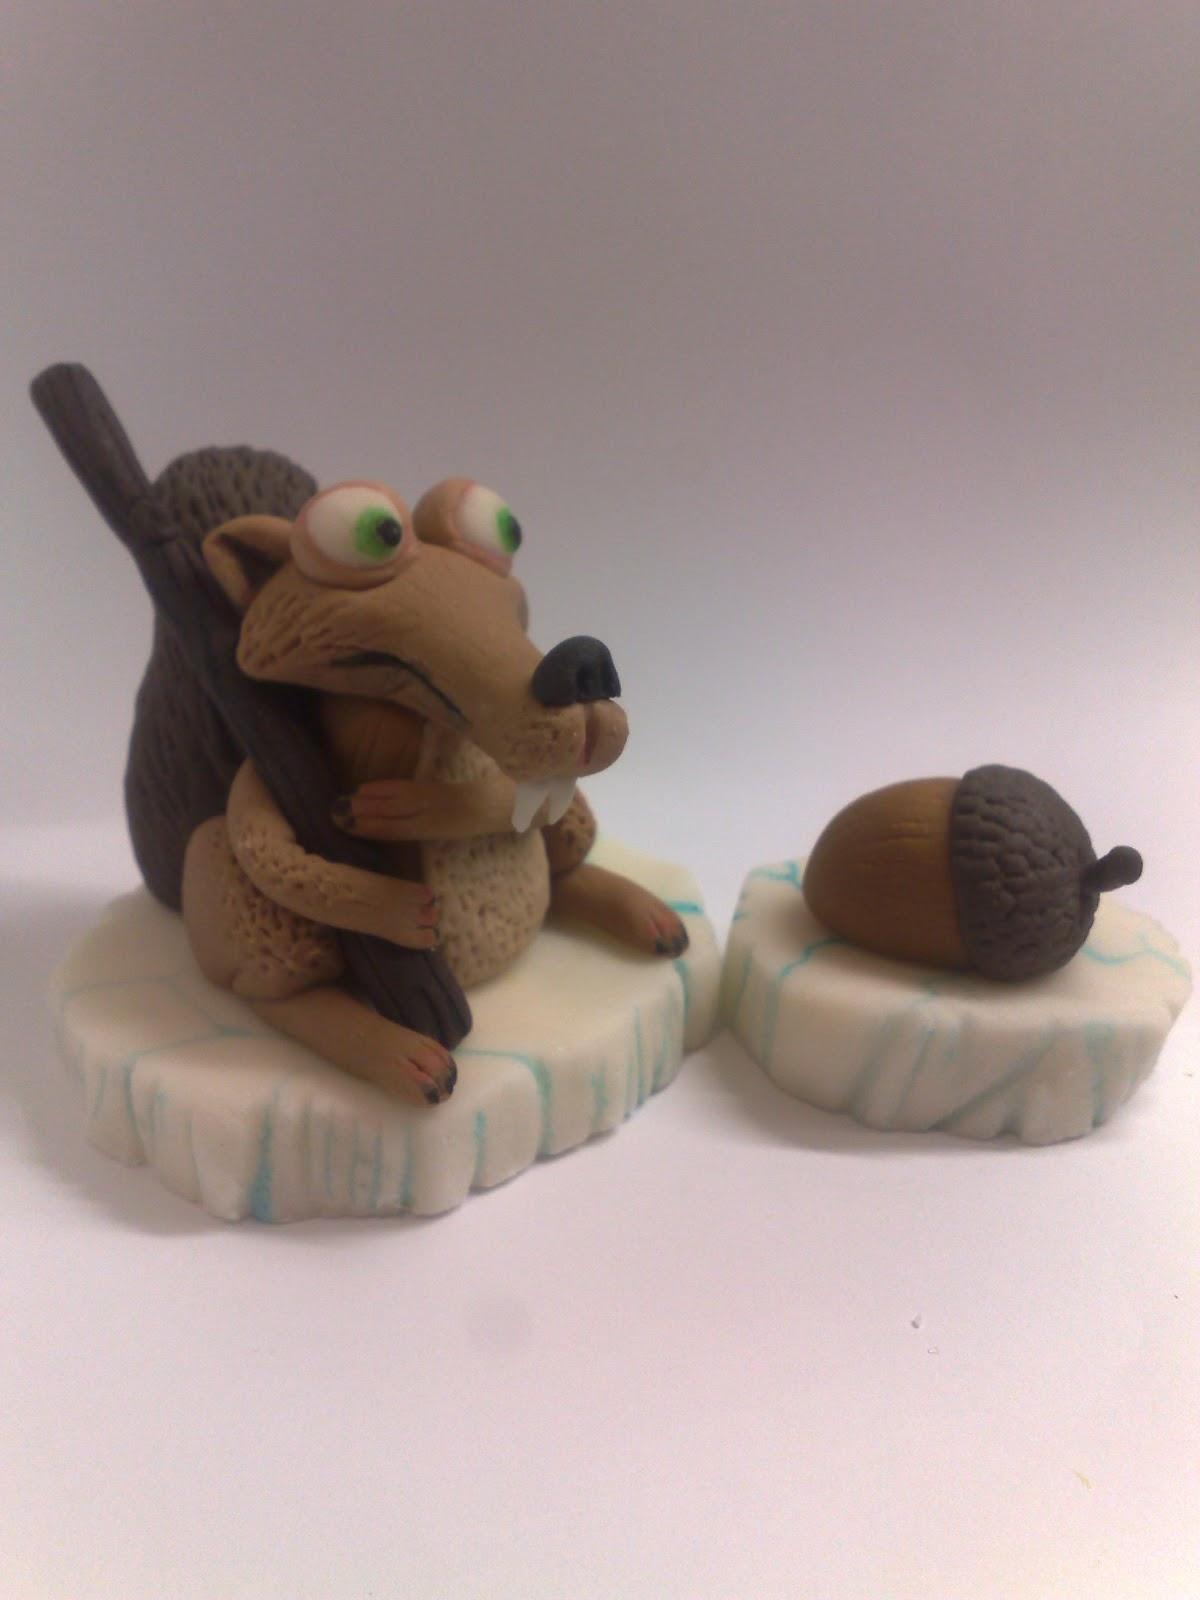 studio fondant design ana figurice za torte fondant figures skret ledeno doba scrat. Black Bedroom Furniture Sets. Home Design Ideas